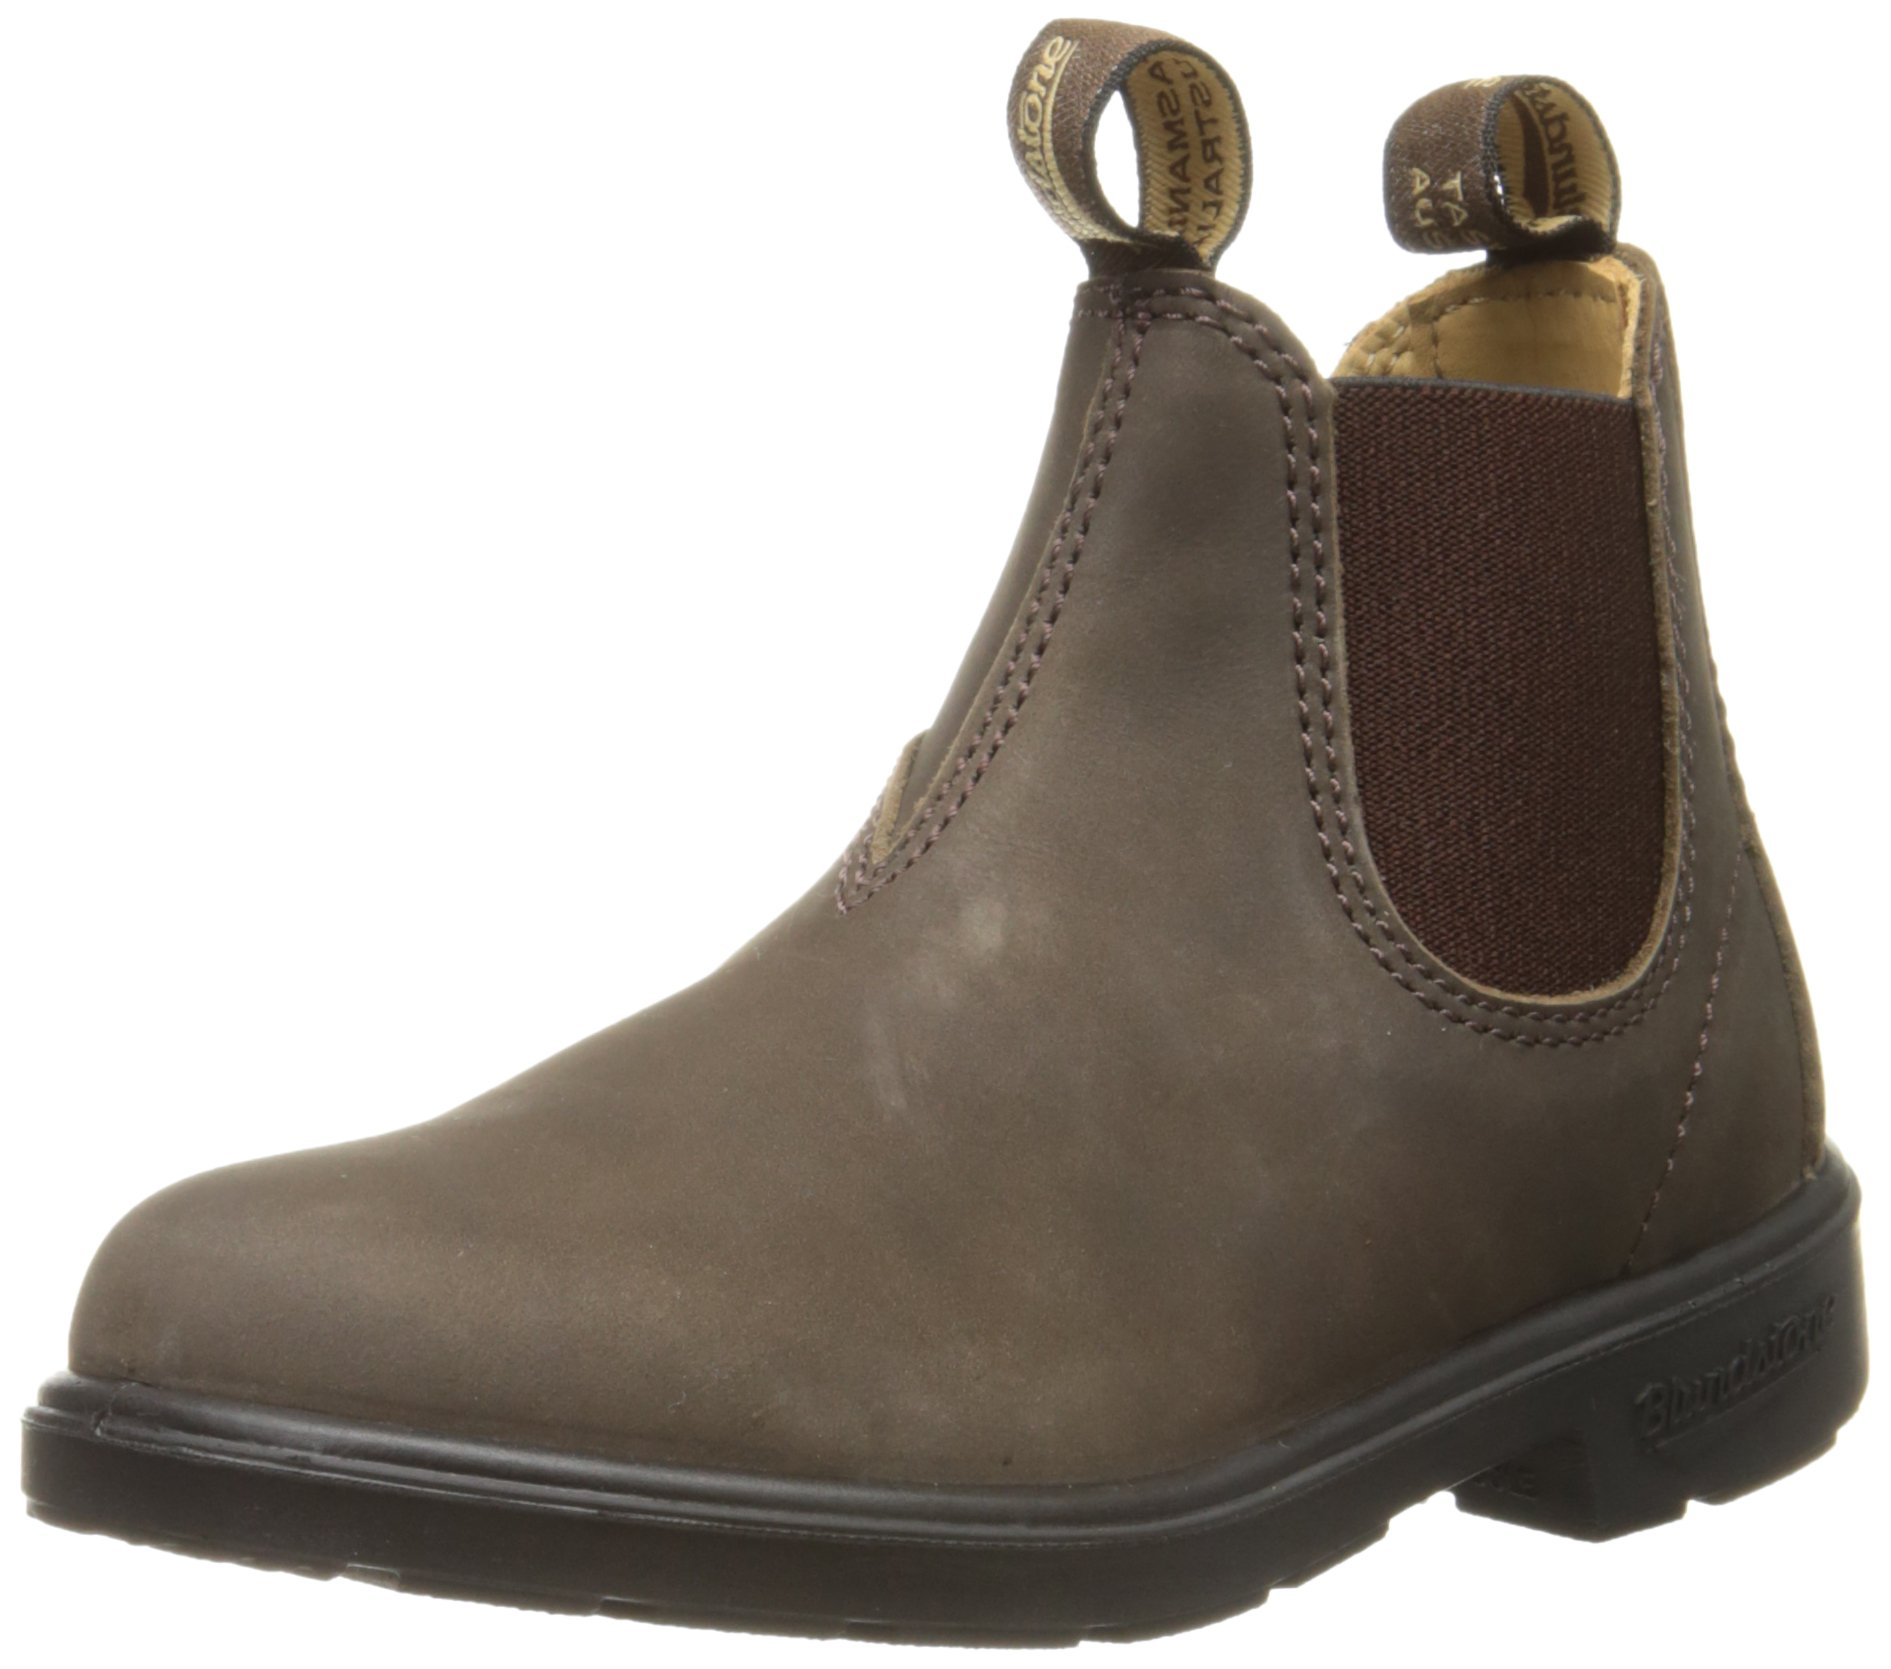 Blundstone 565 Pull-On Chelsea Boot (Infant/Toddler/Little Kid/Big Kid), Rustic Brown, 1 AU(2-2.5 M US Infant)